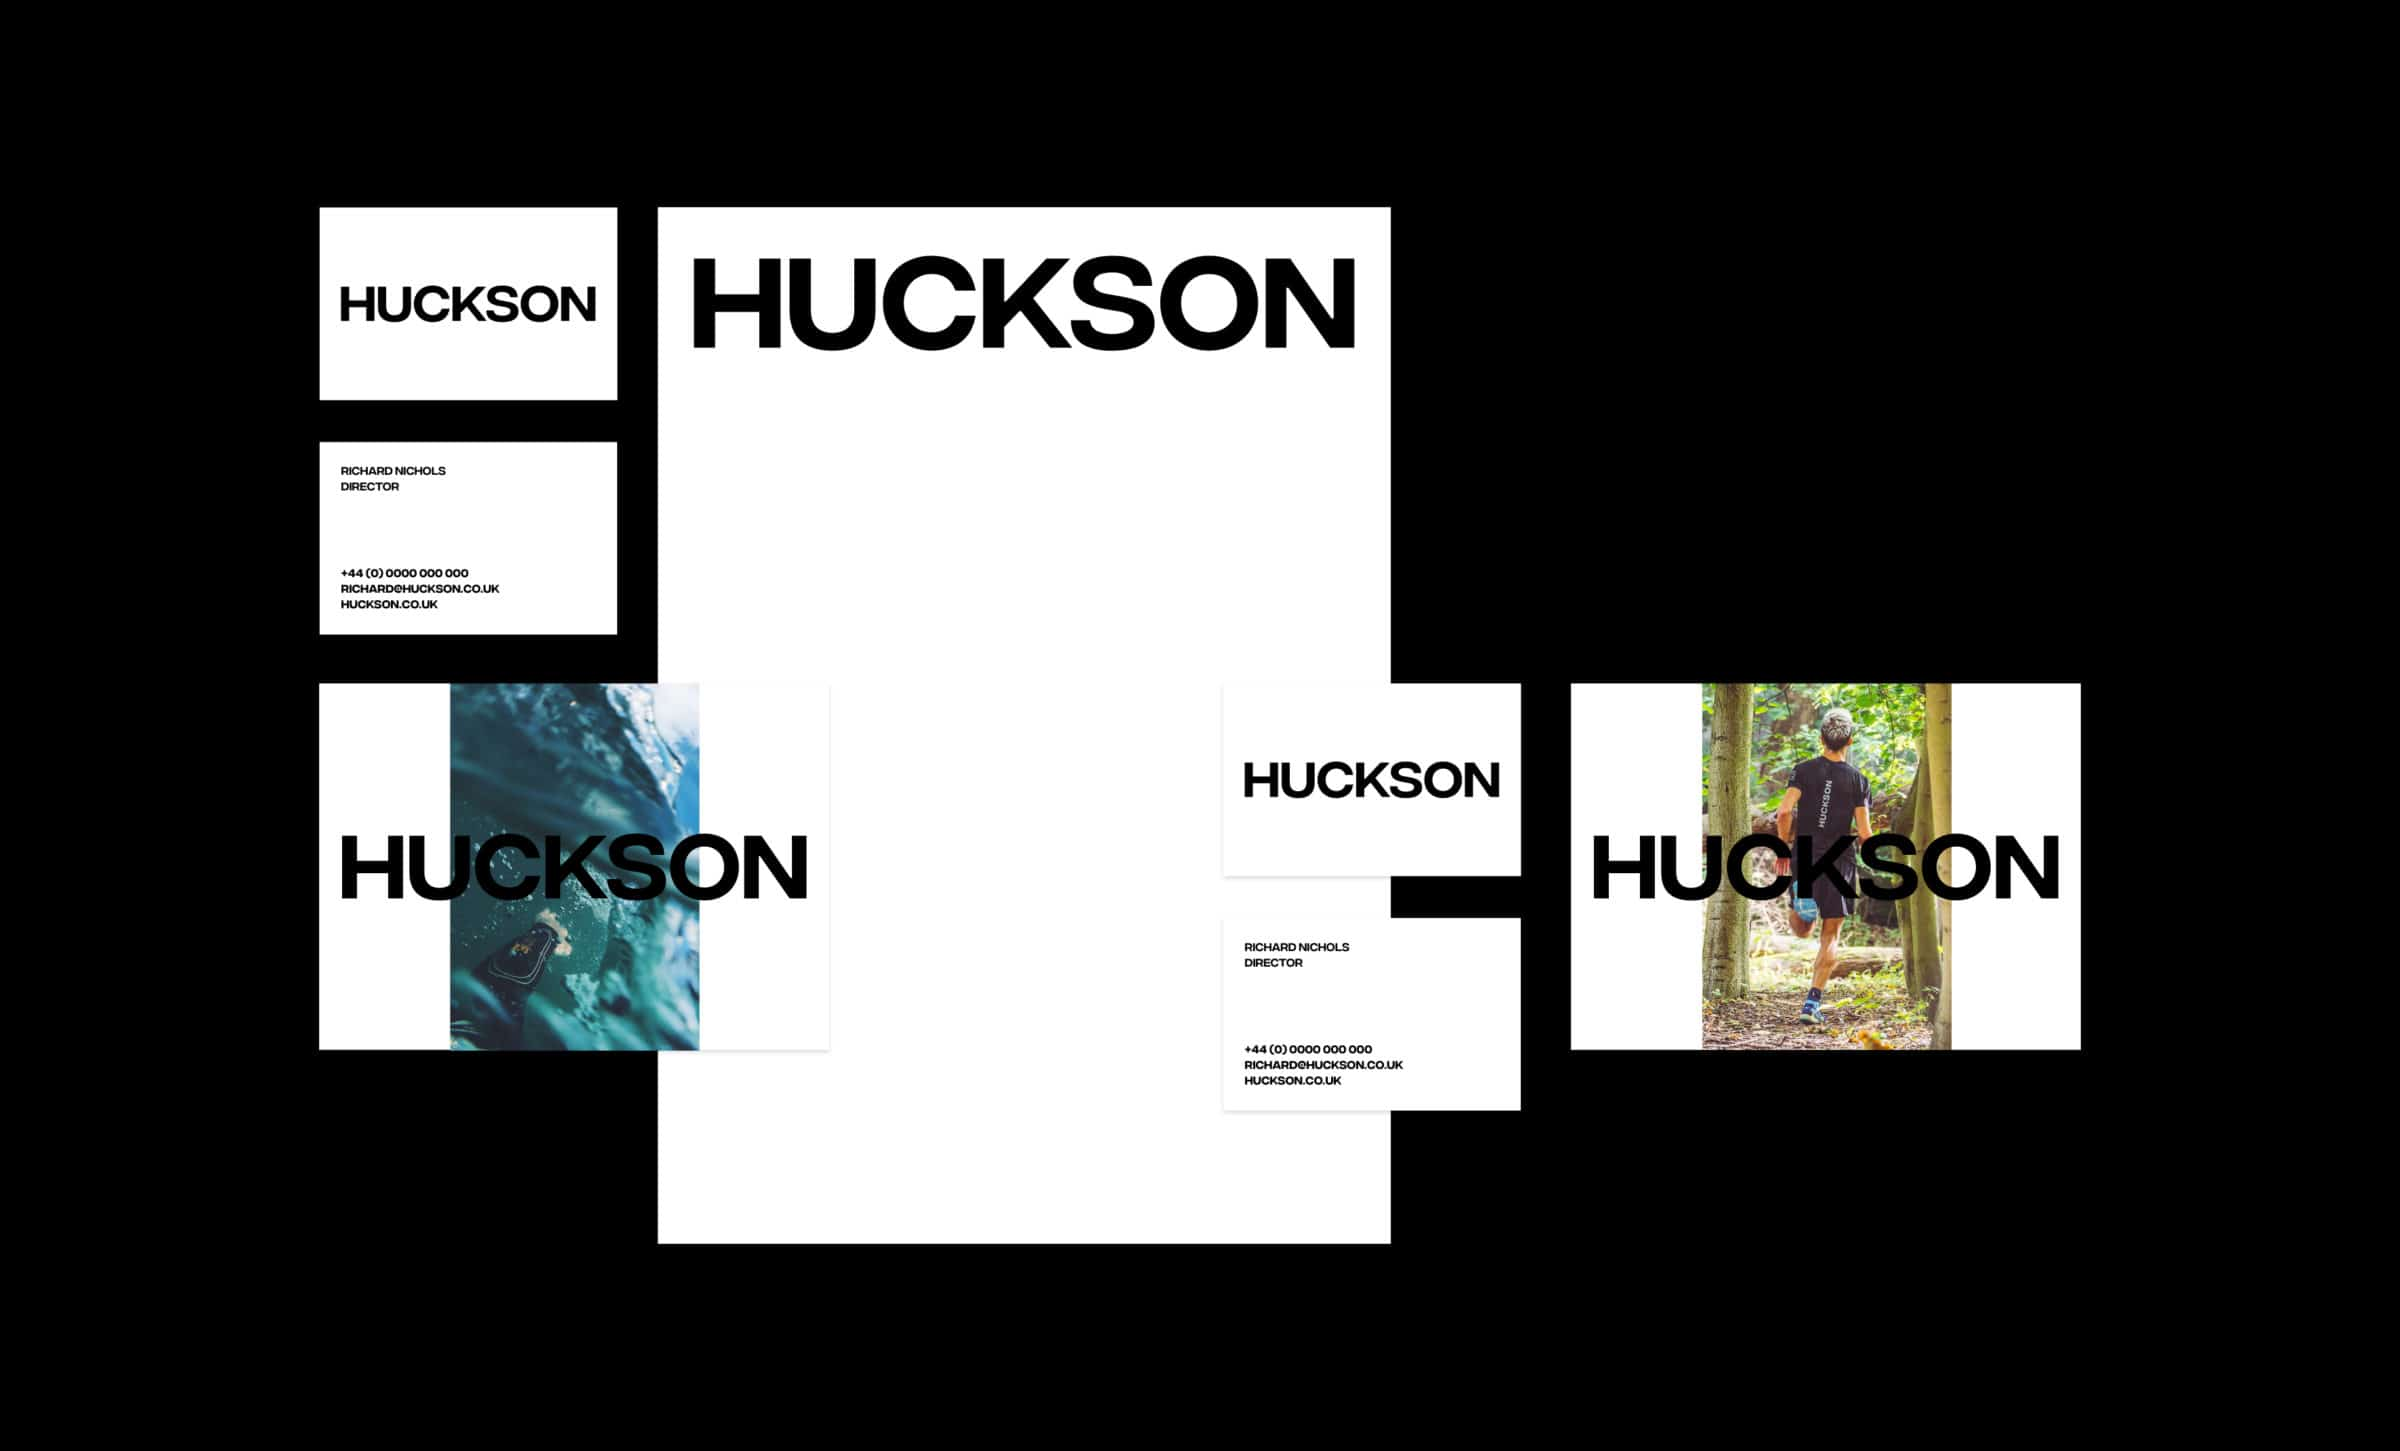 Huckson business stationary